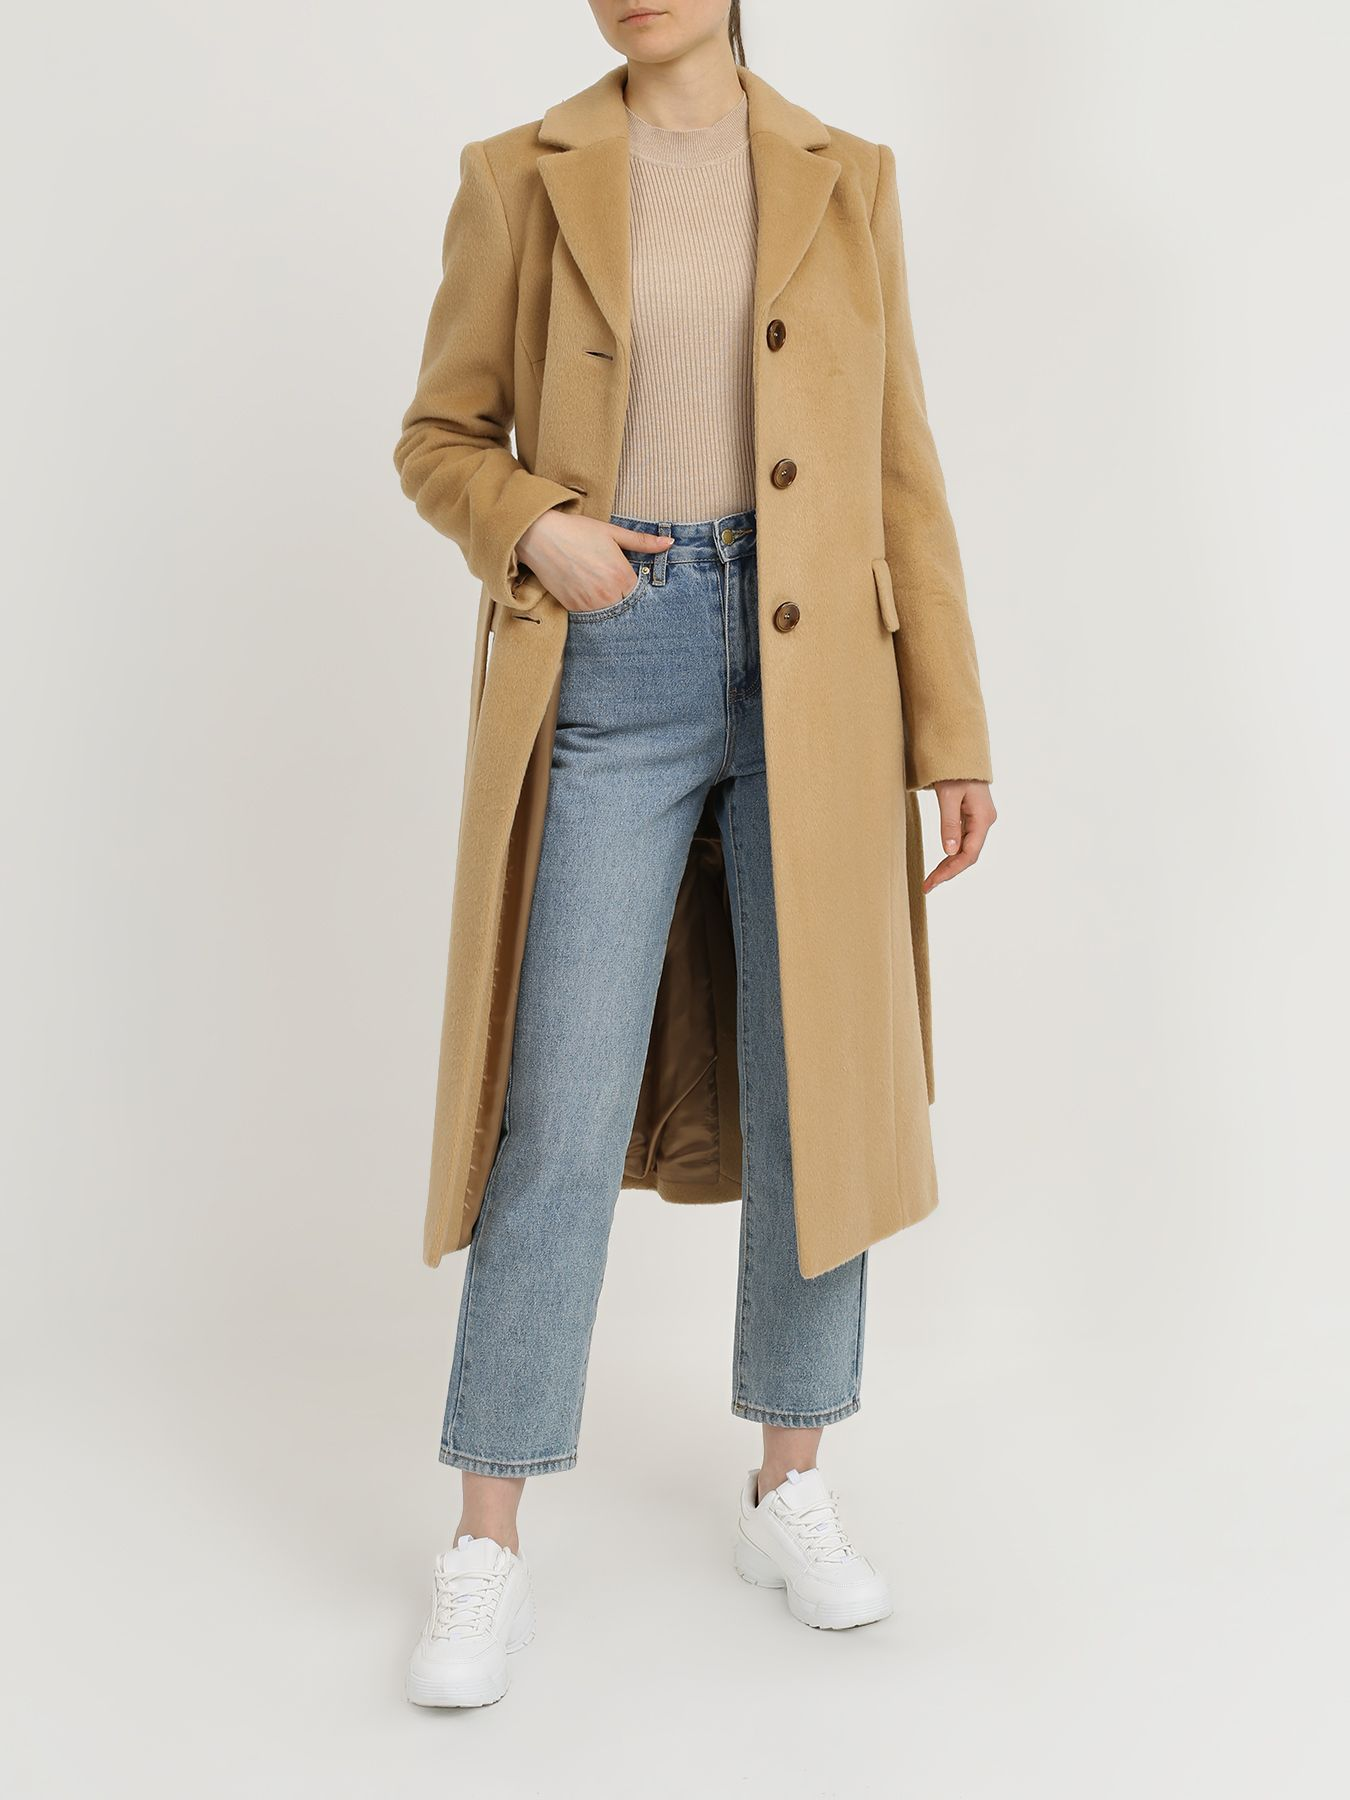 Пальто Korpo Длинное пальто пальто imperial пальто